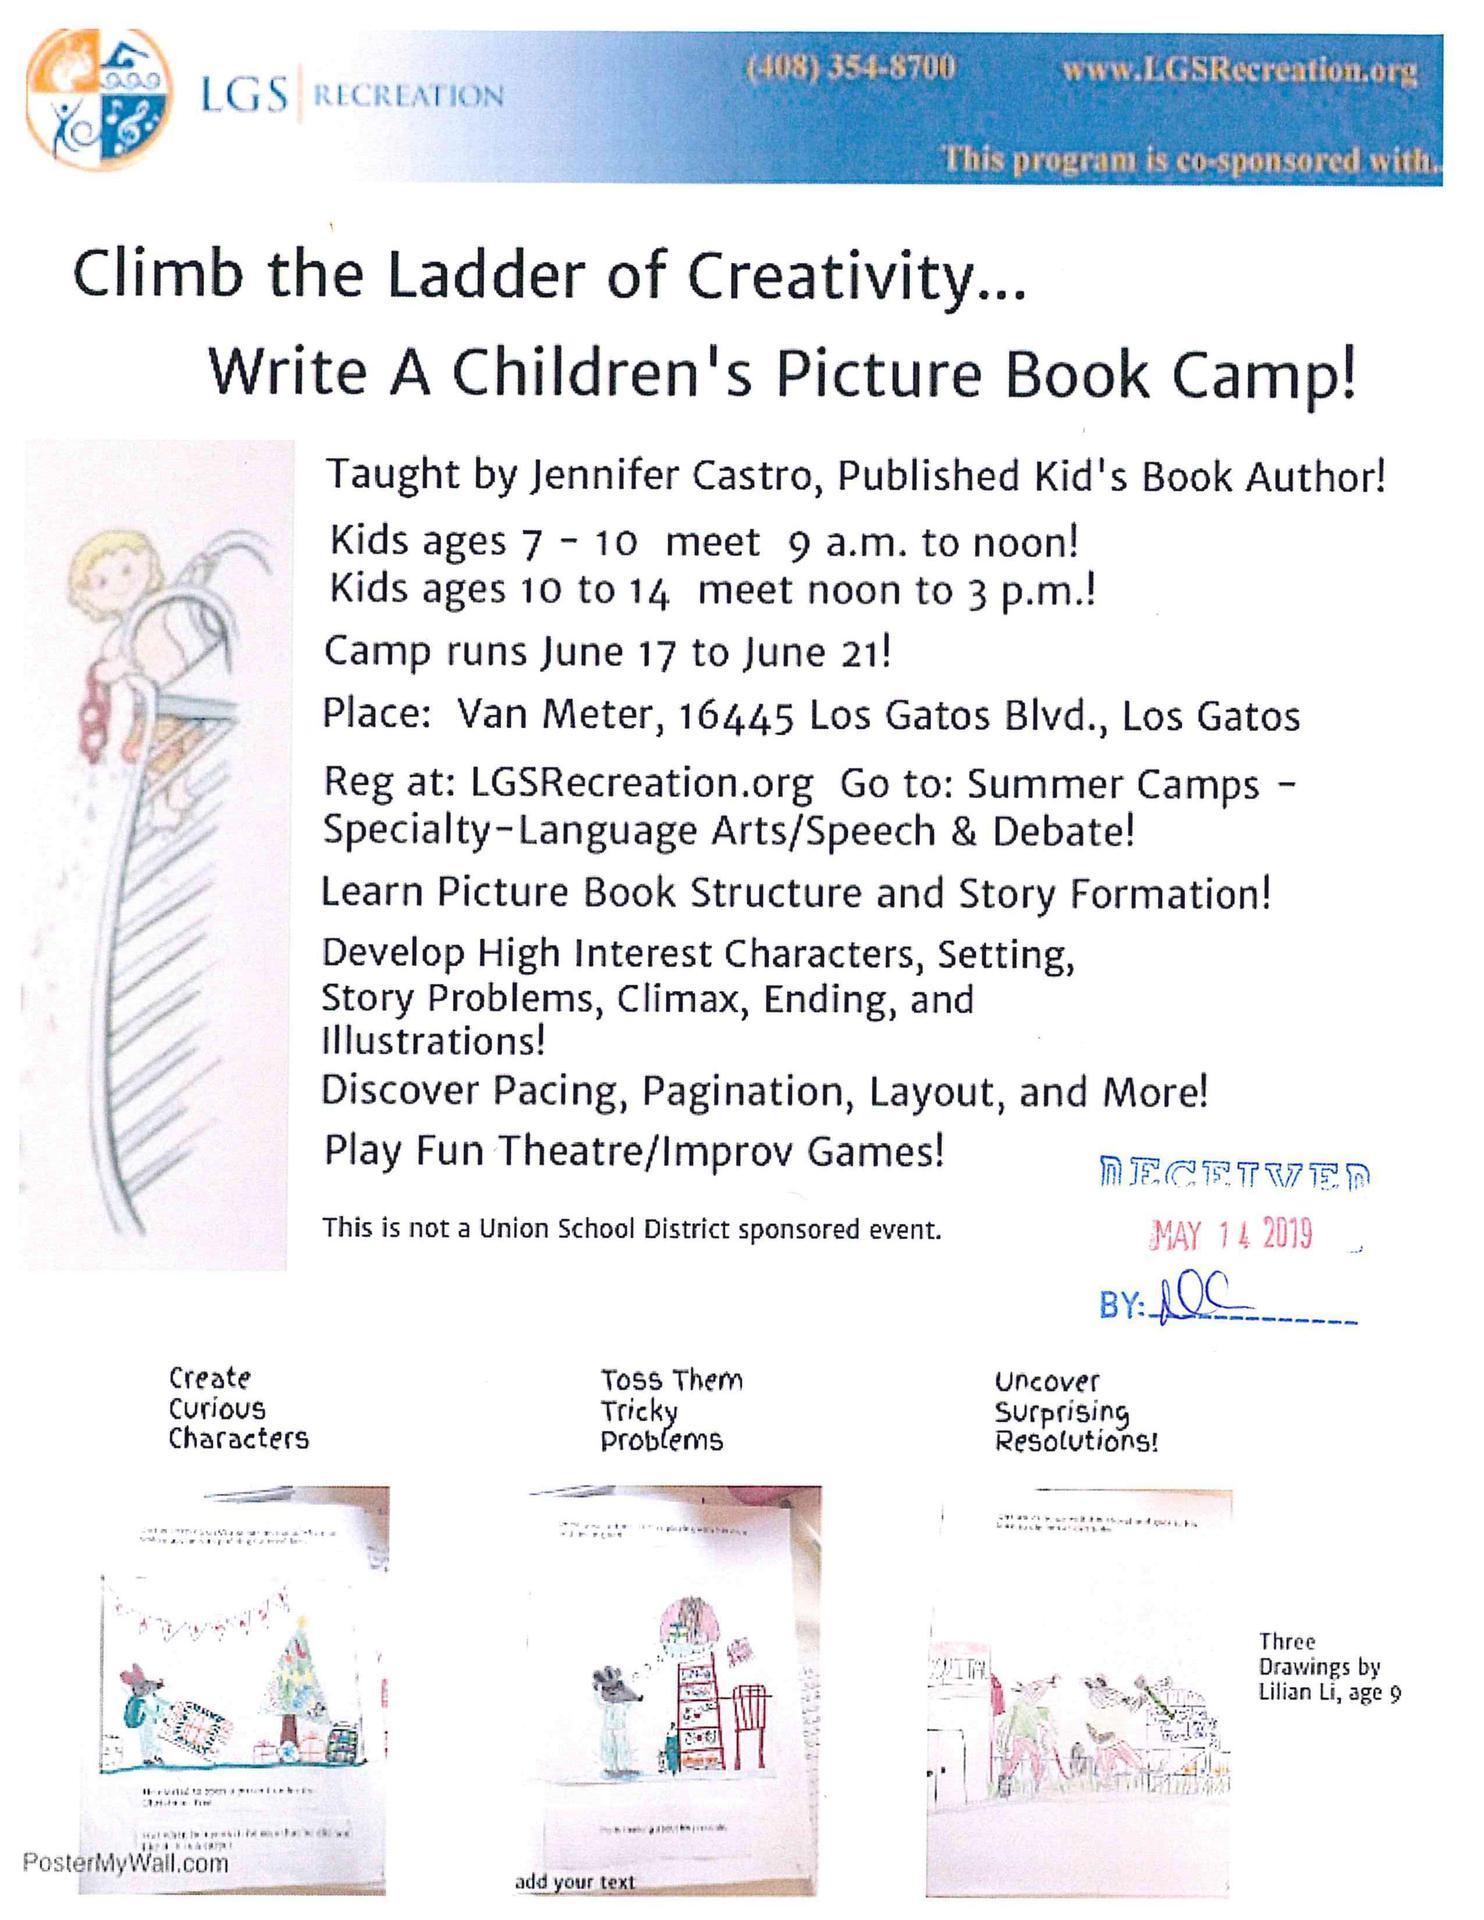 Write a Children's Picture Book Camp